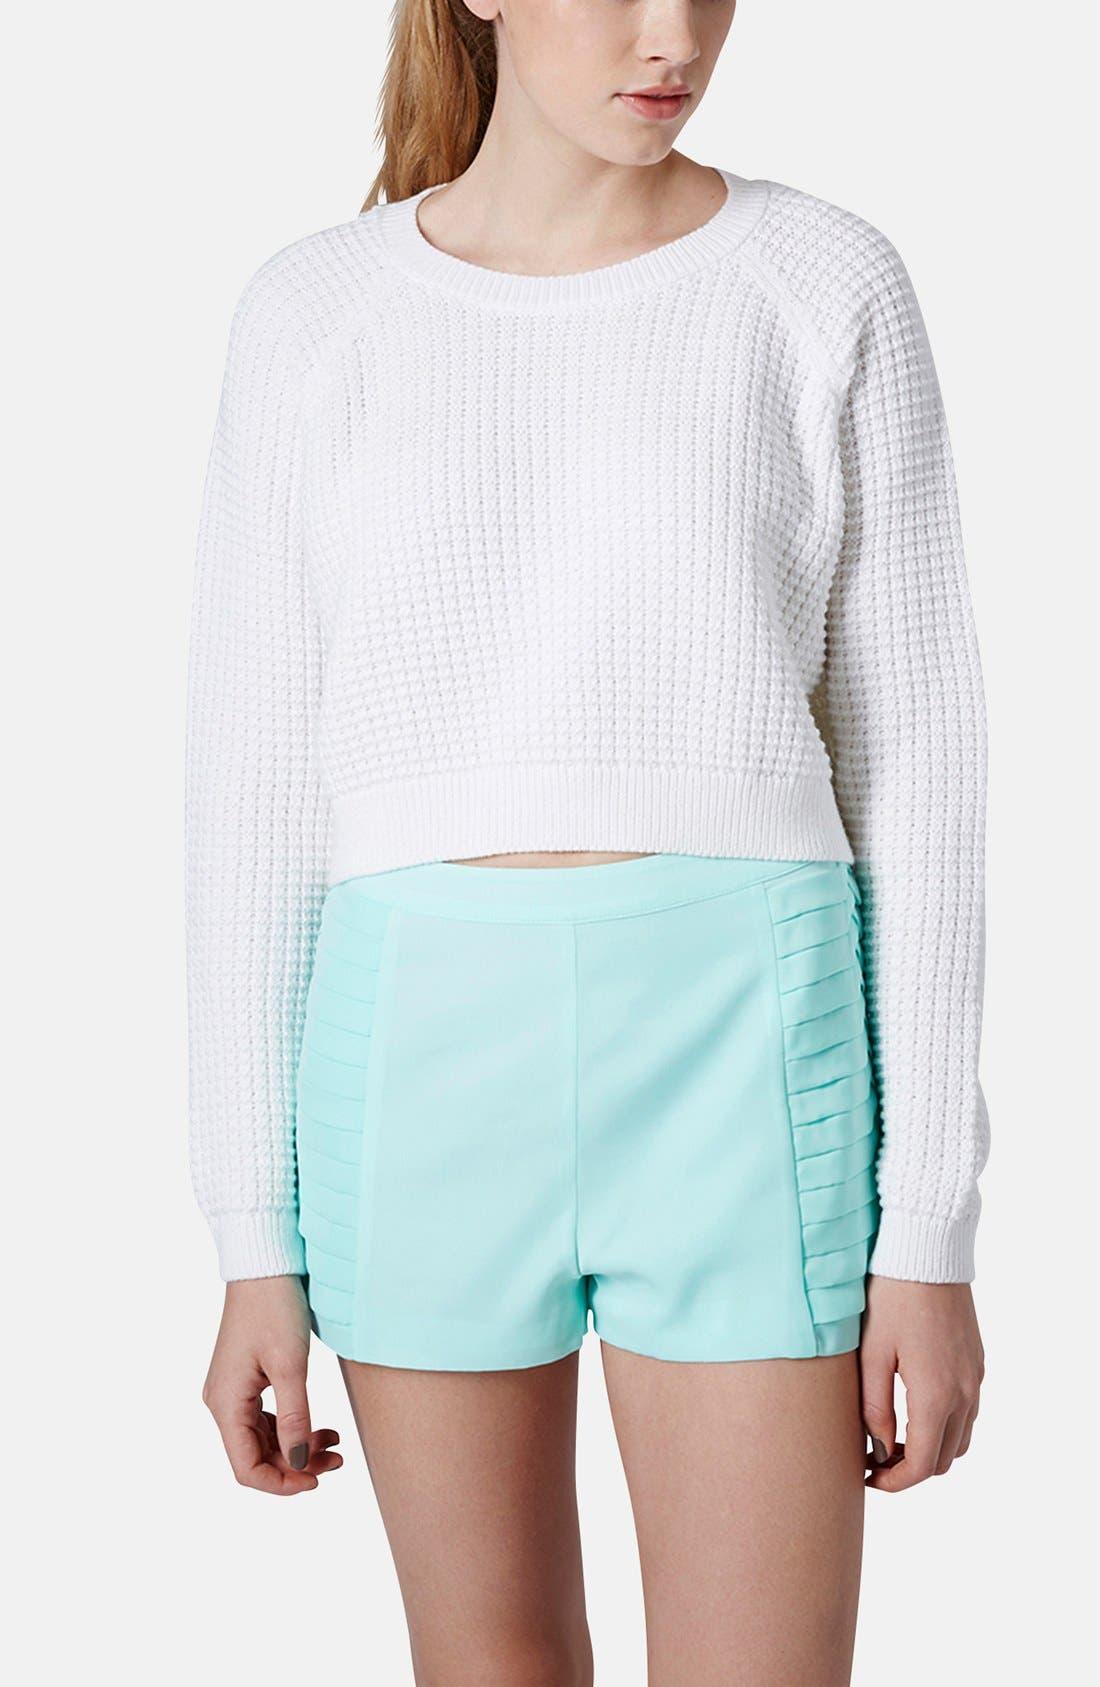 Alternate Image 1 Selected - Topshop 'Fisherman' Crop Sweater